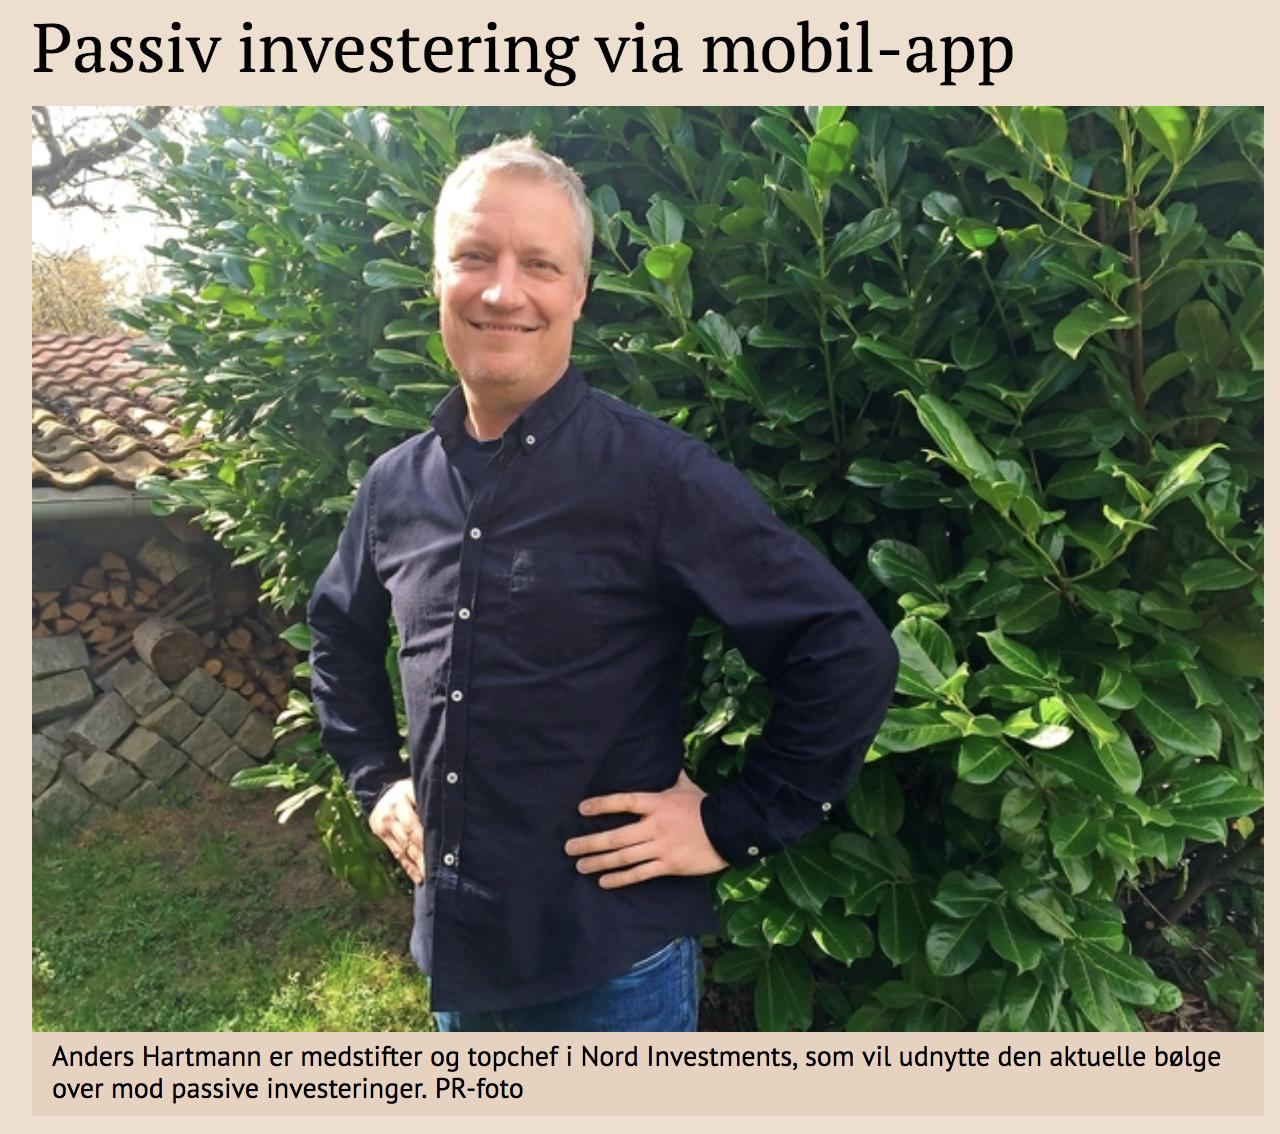 Passiv investering via mobil-app